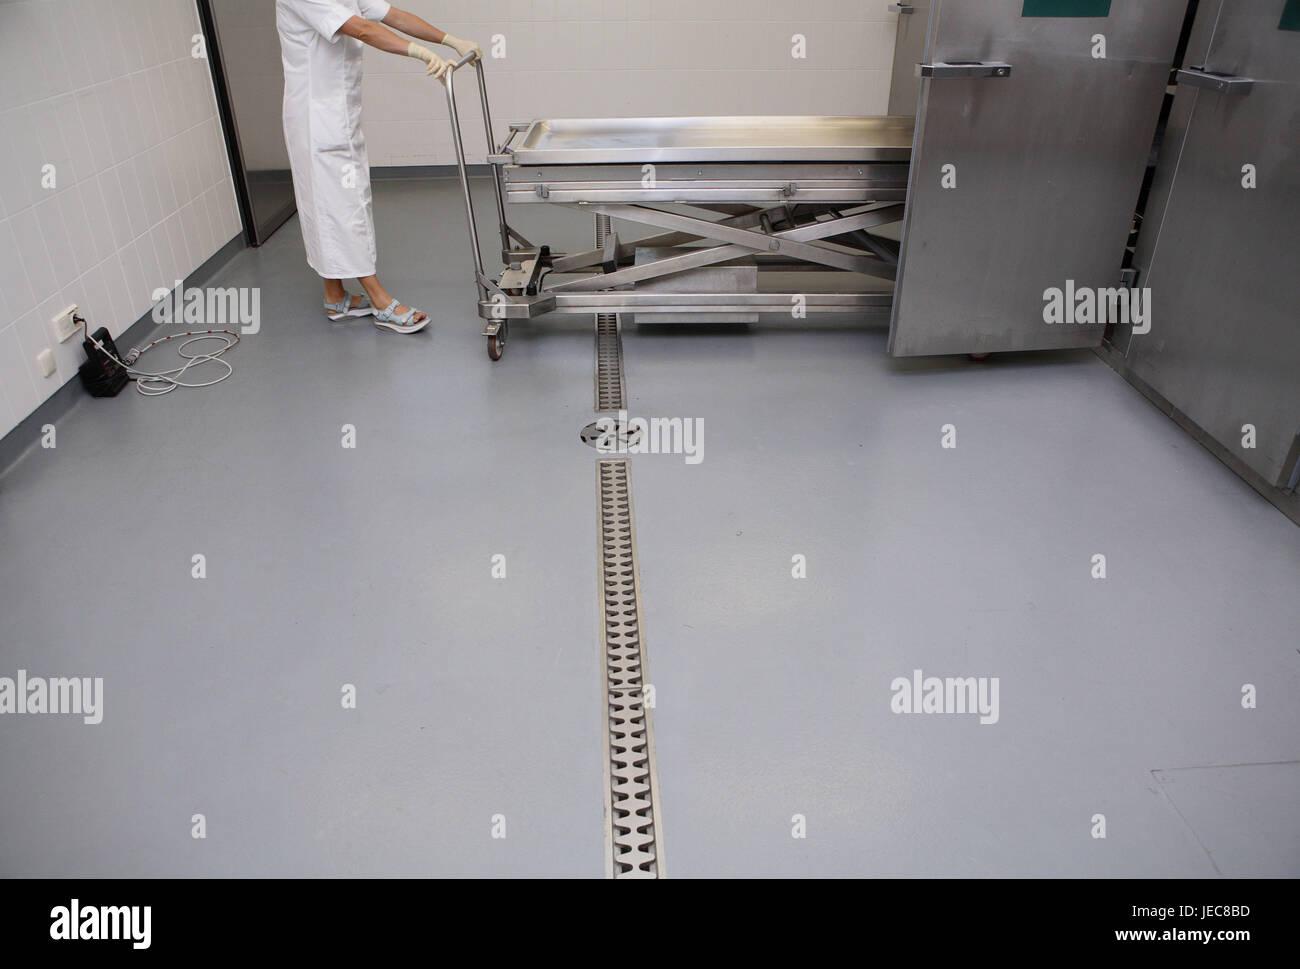 Hospital, departamento de anatomía patológica-, Angestelle Prosektur ...